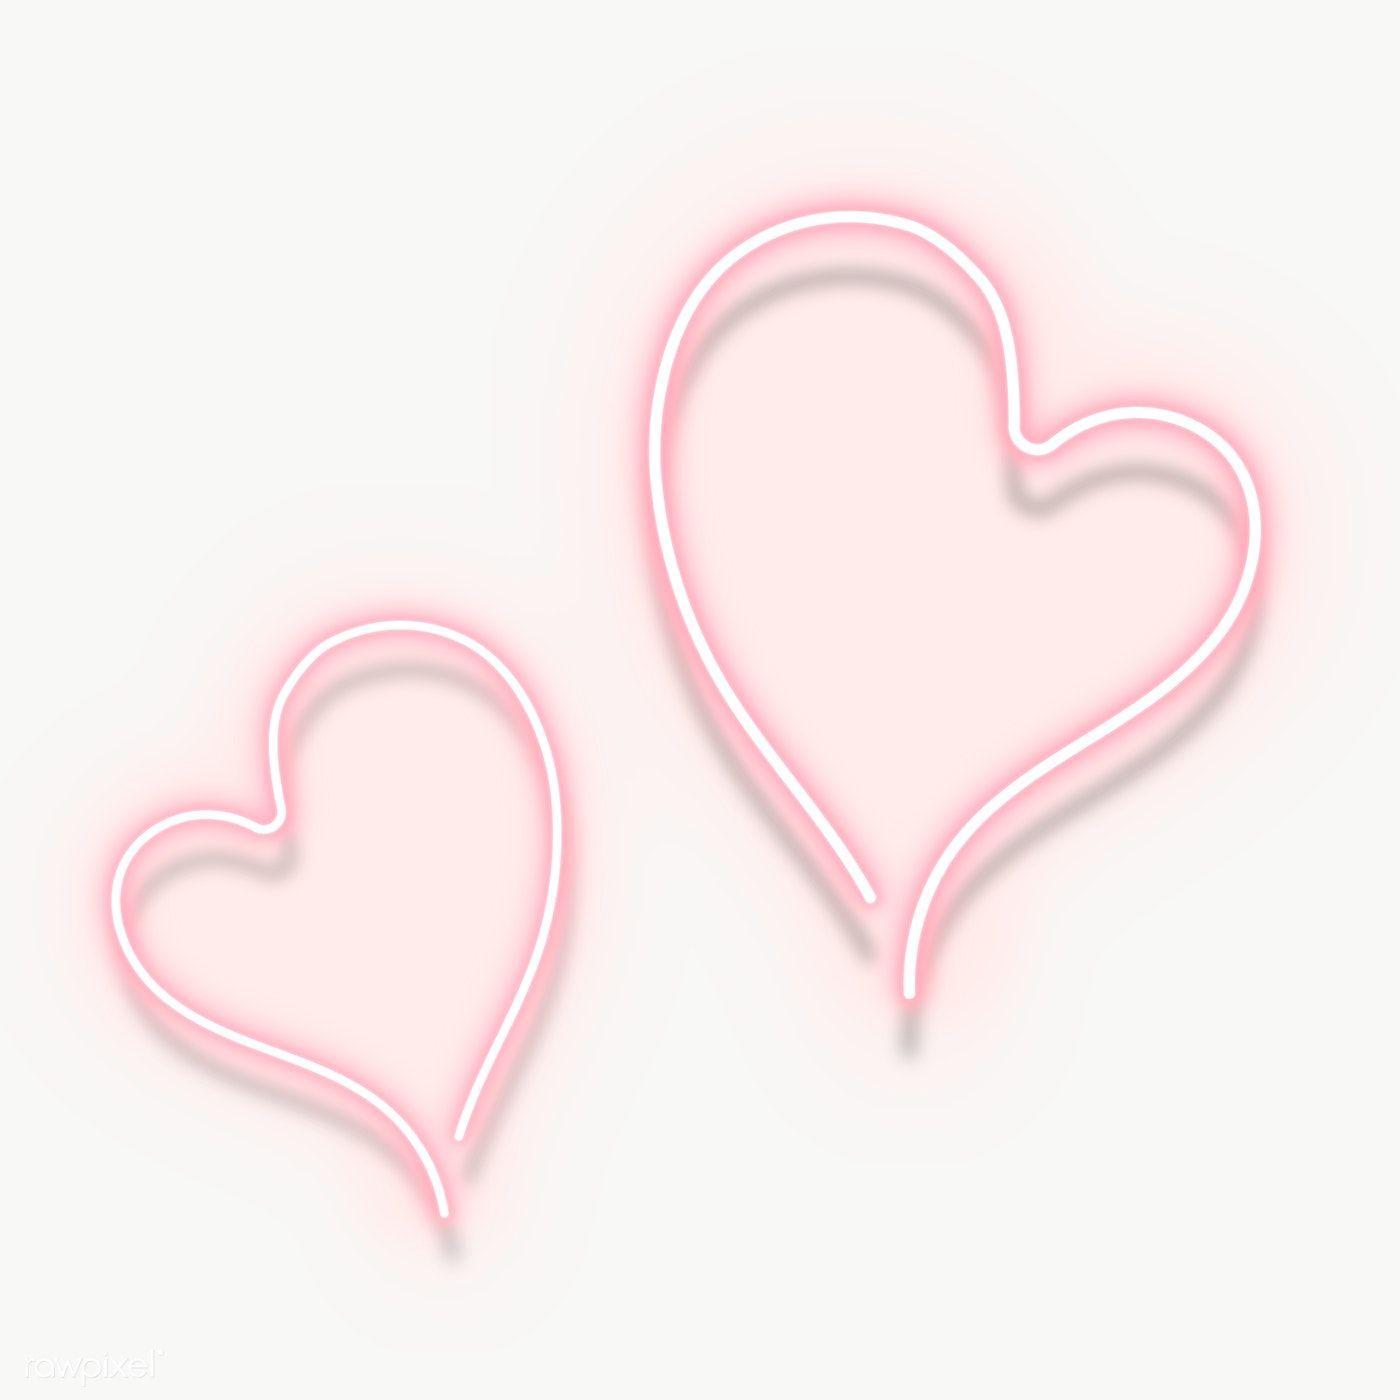 Pink Neon Double Hearts Transparent Png Premium Image By Rawpixel Com Aew Neon Typography Pink Neon Lights Neon